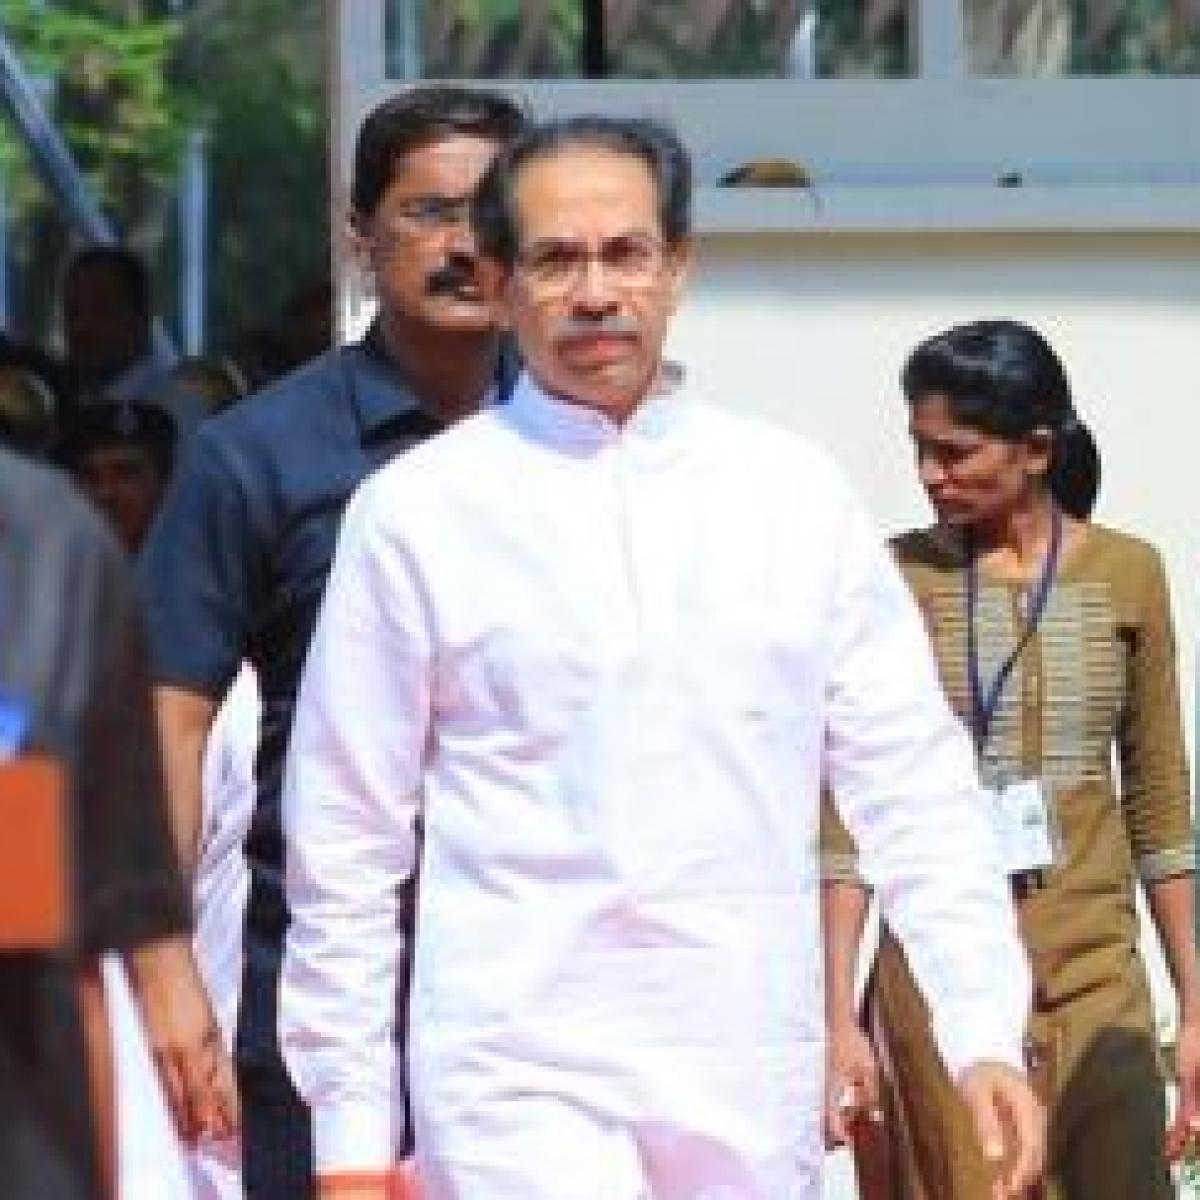 'Don't get distracted by BJP's attempt to create division': CM Uddhav Thackeray tells Maha Vikas Aghadi legislators